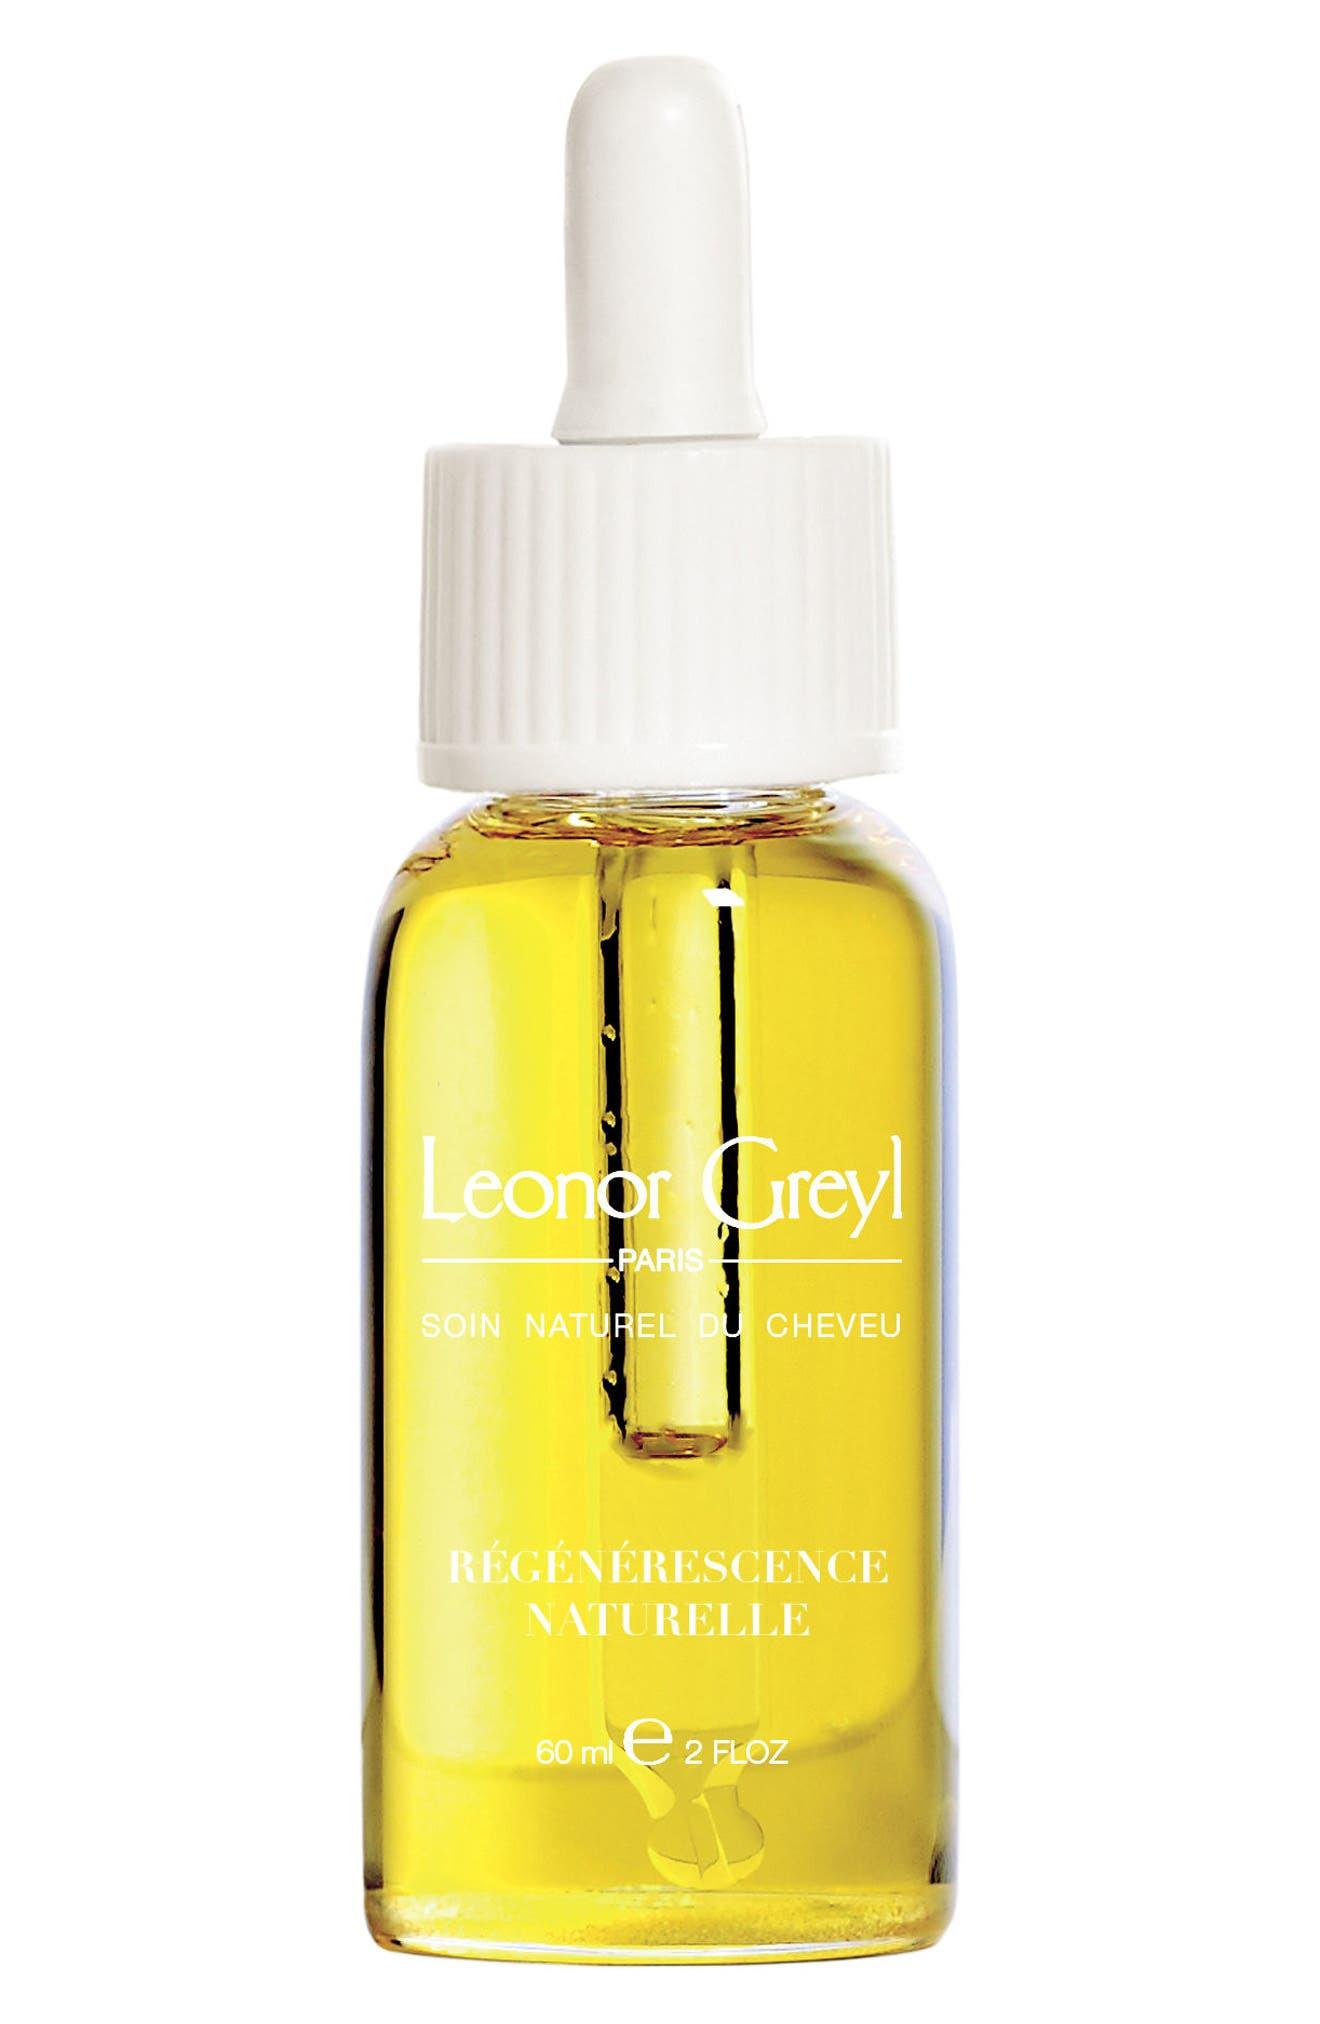 Alternate Image 1 Selected - Leonor Greyl PARIS 'Régénérescence Naturelle' Pre-Shampoo Treatment